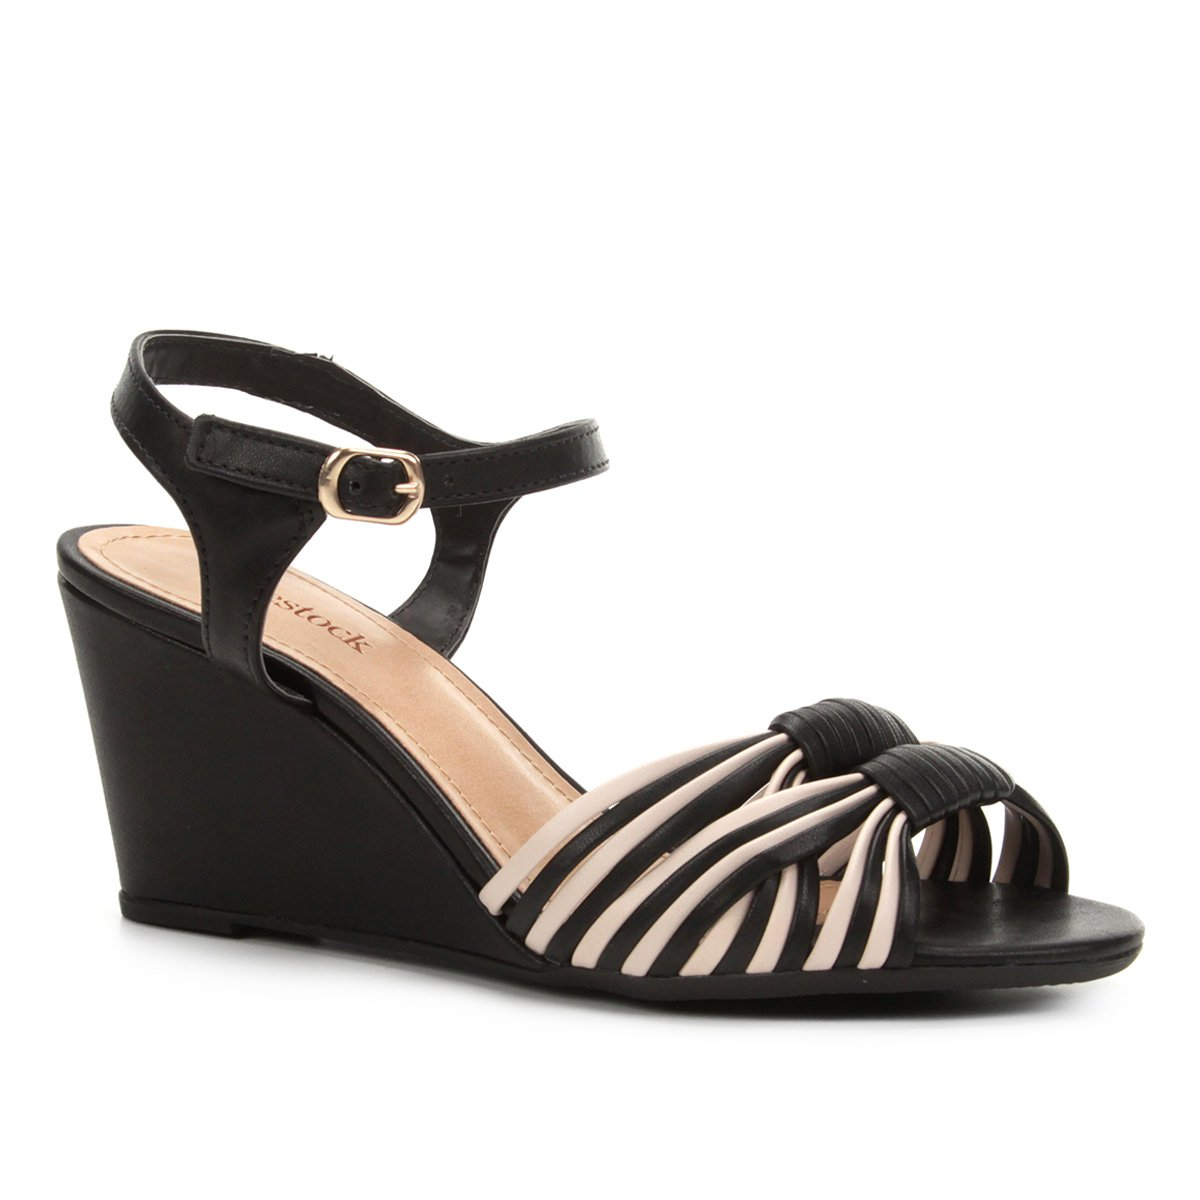 8f542a2c5 Sandália Anabela Shoestock Tiras Bicolor Feminina